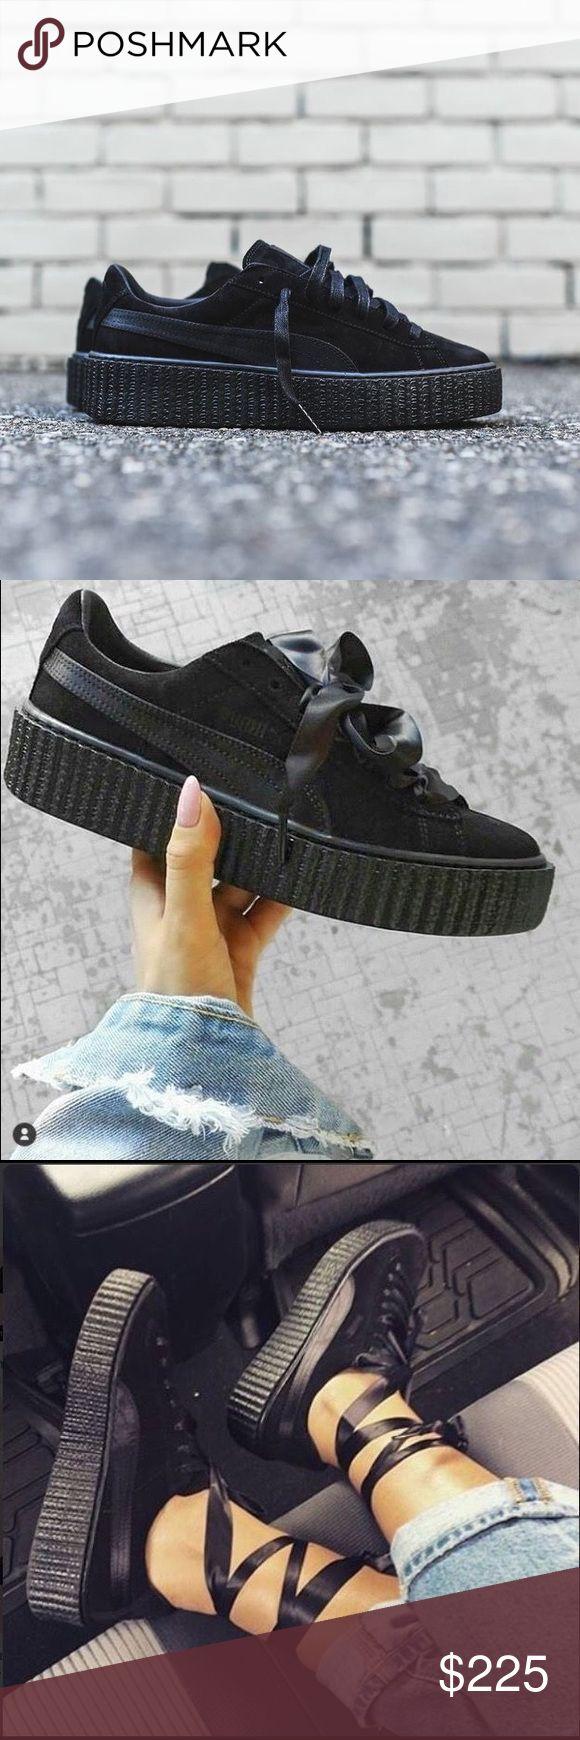 Puma x Rihanna Creepers in Black Satin Puma x Rihanna Creepers in Black Satin. Brand new with original box + laces. Cheaper through depop or ️️ Puma Shoes Sneakers